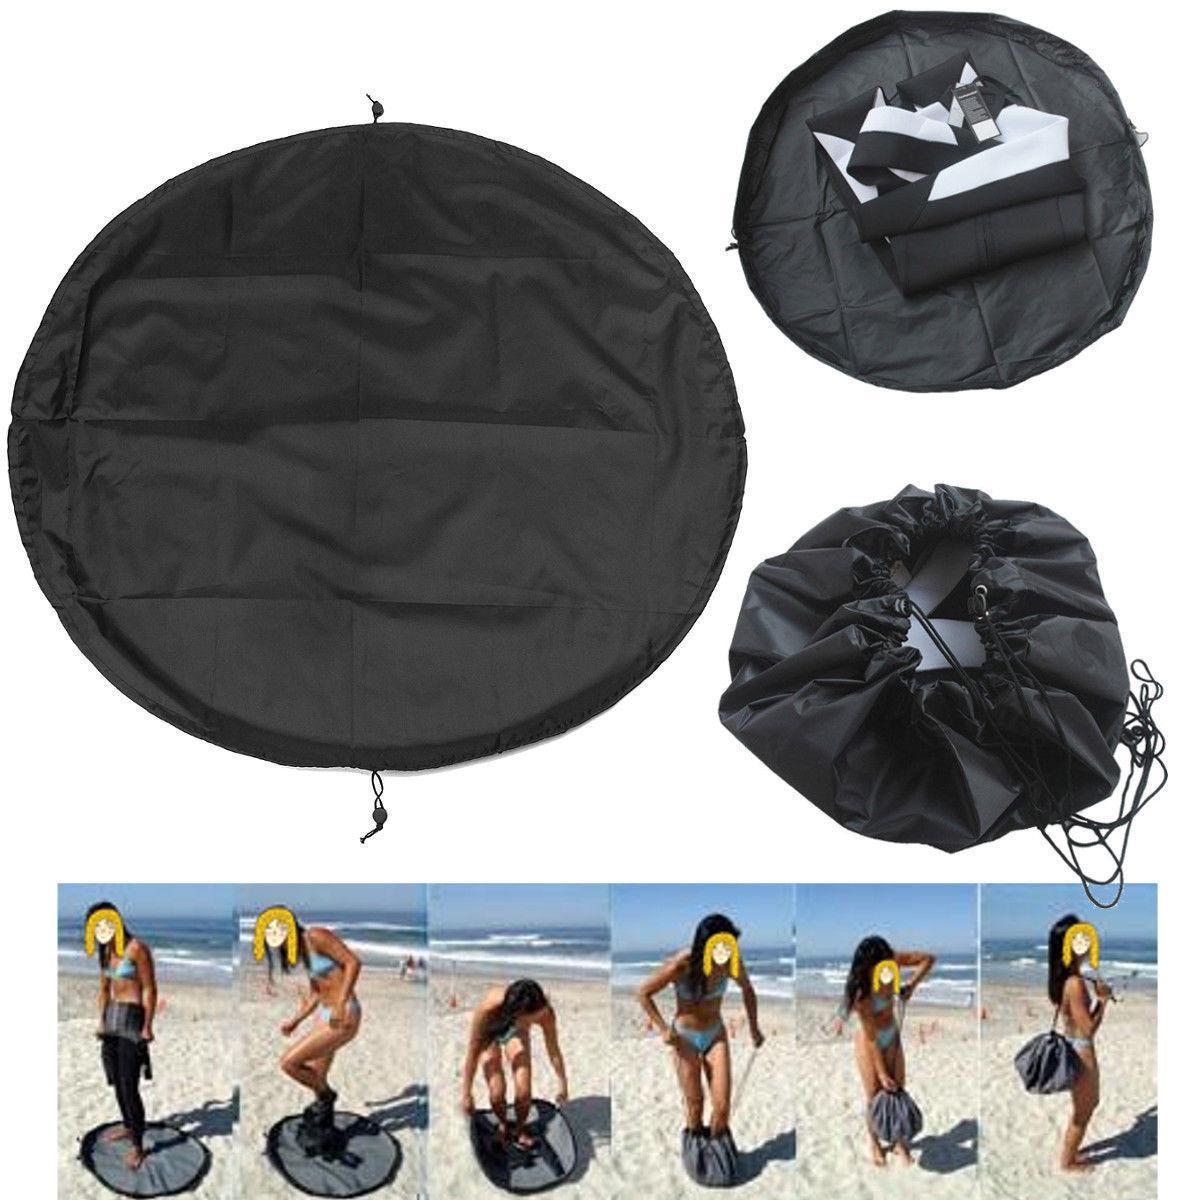 OS Beach Swiming Suit Storage Bag Quick Storage Bag for Beach Holiday 90cm